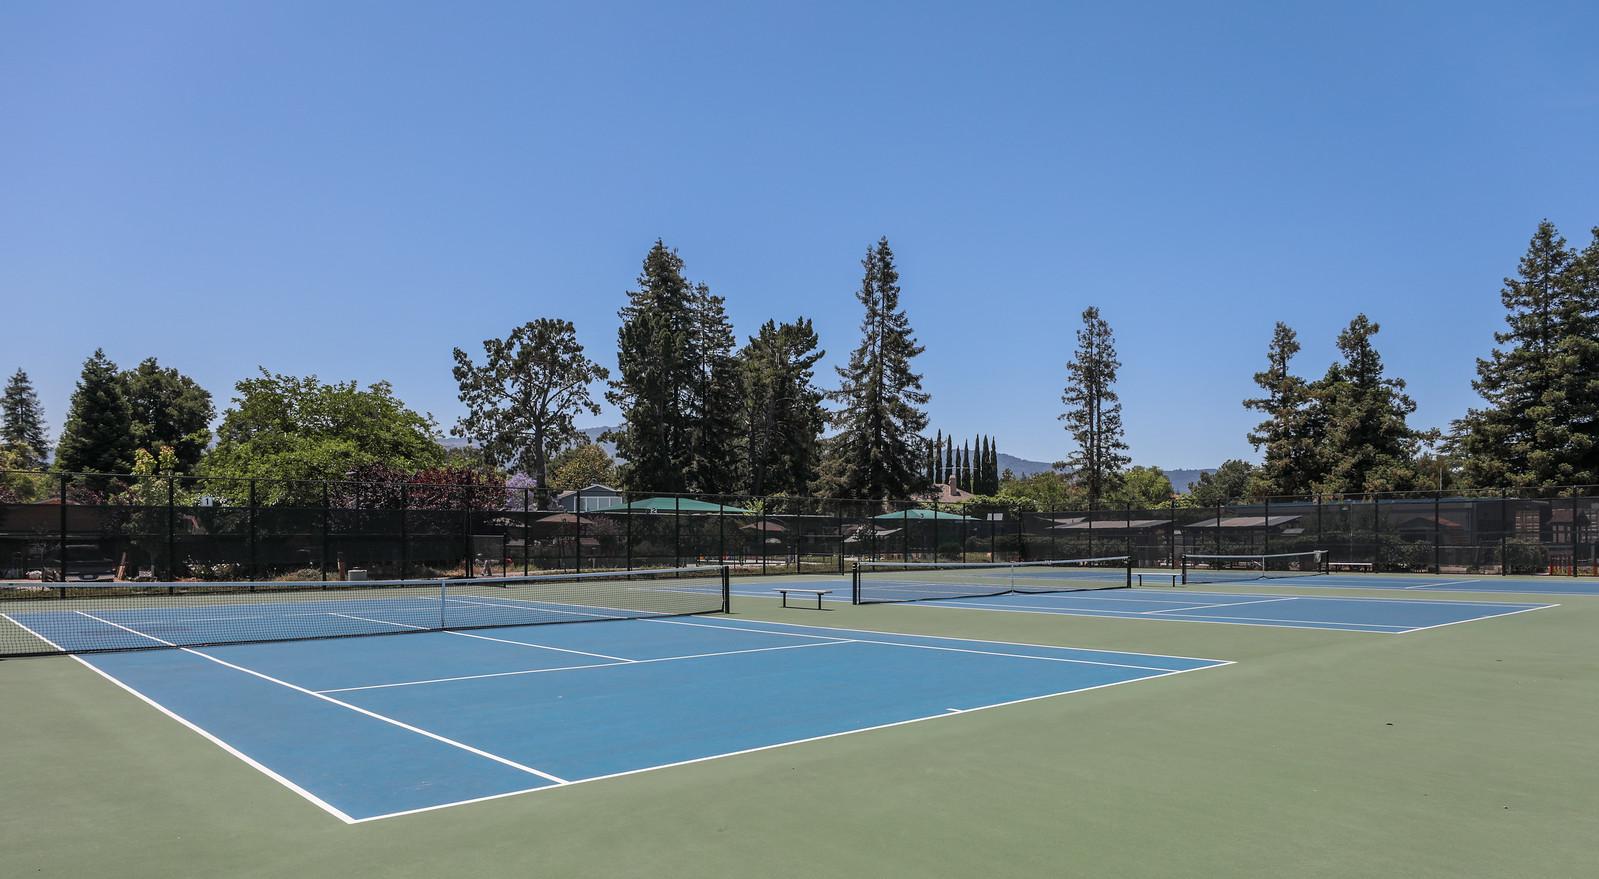 Rosita Park Los Altos Blu Skye Media-8762-X3.jpg